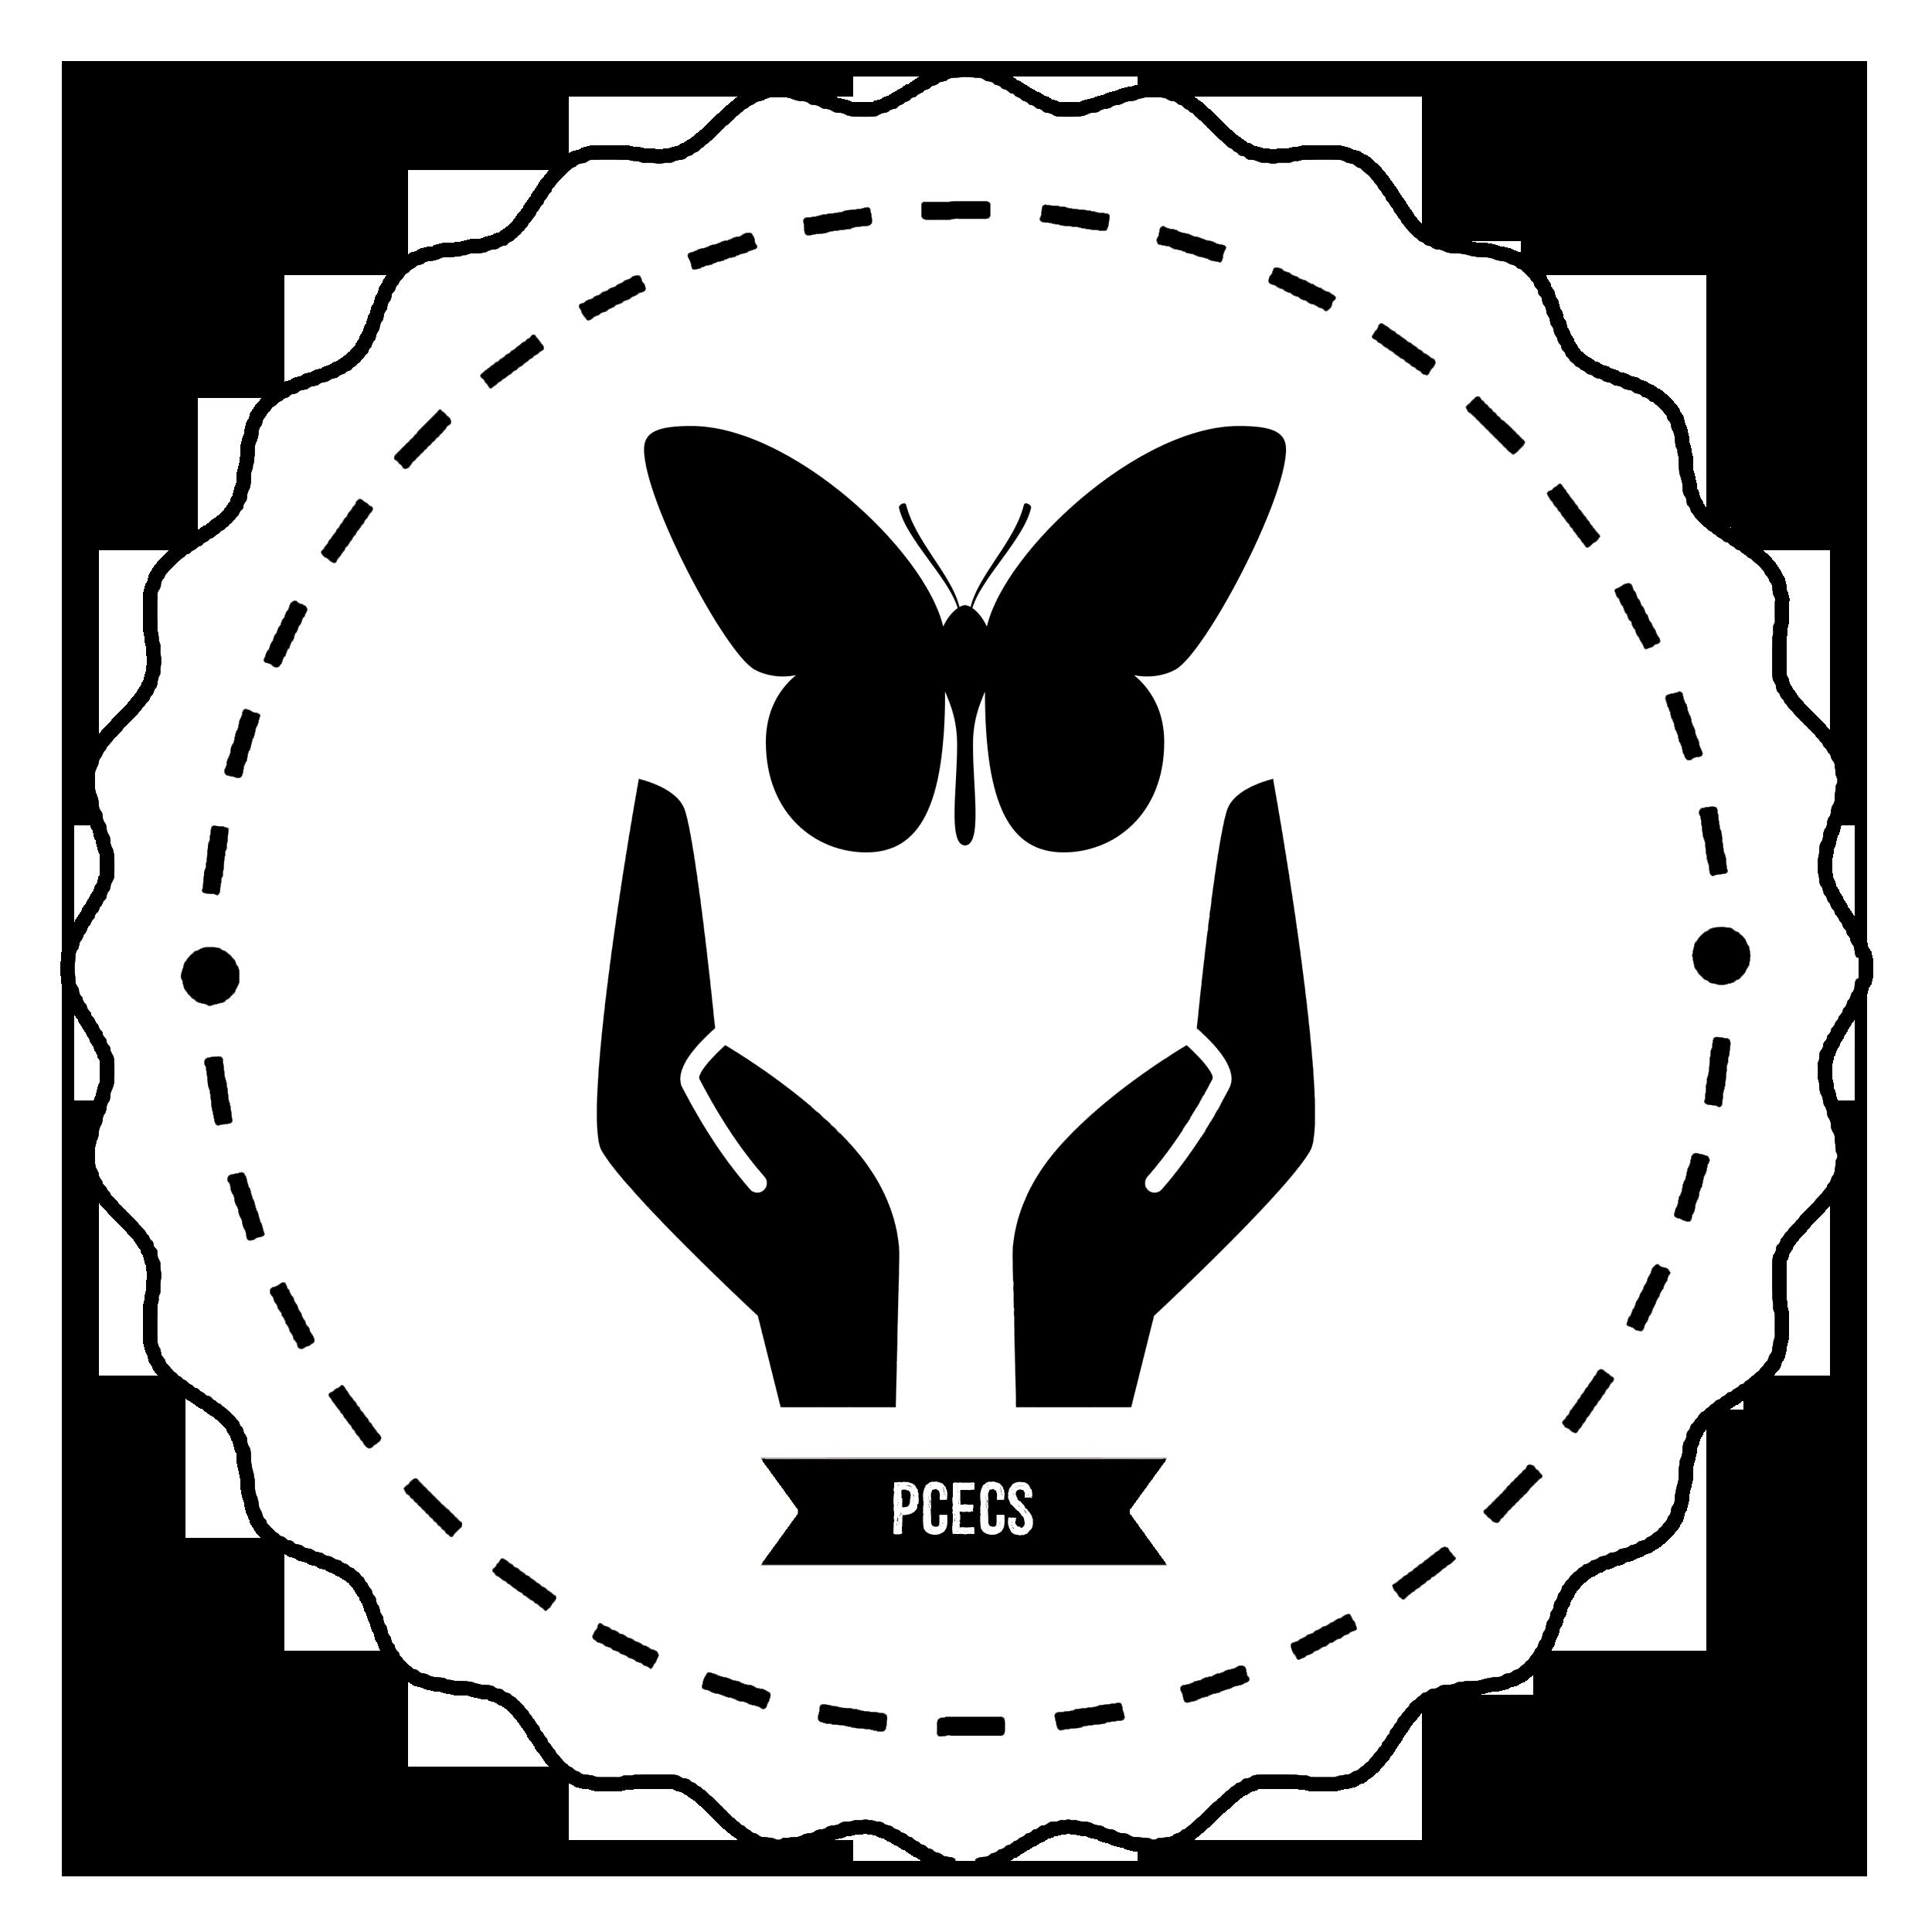 PCECS